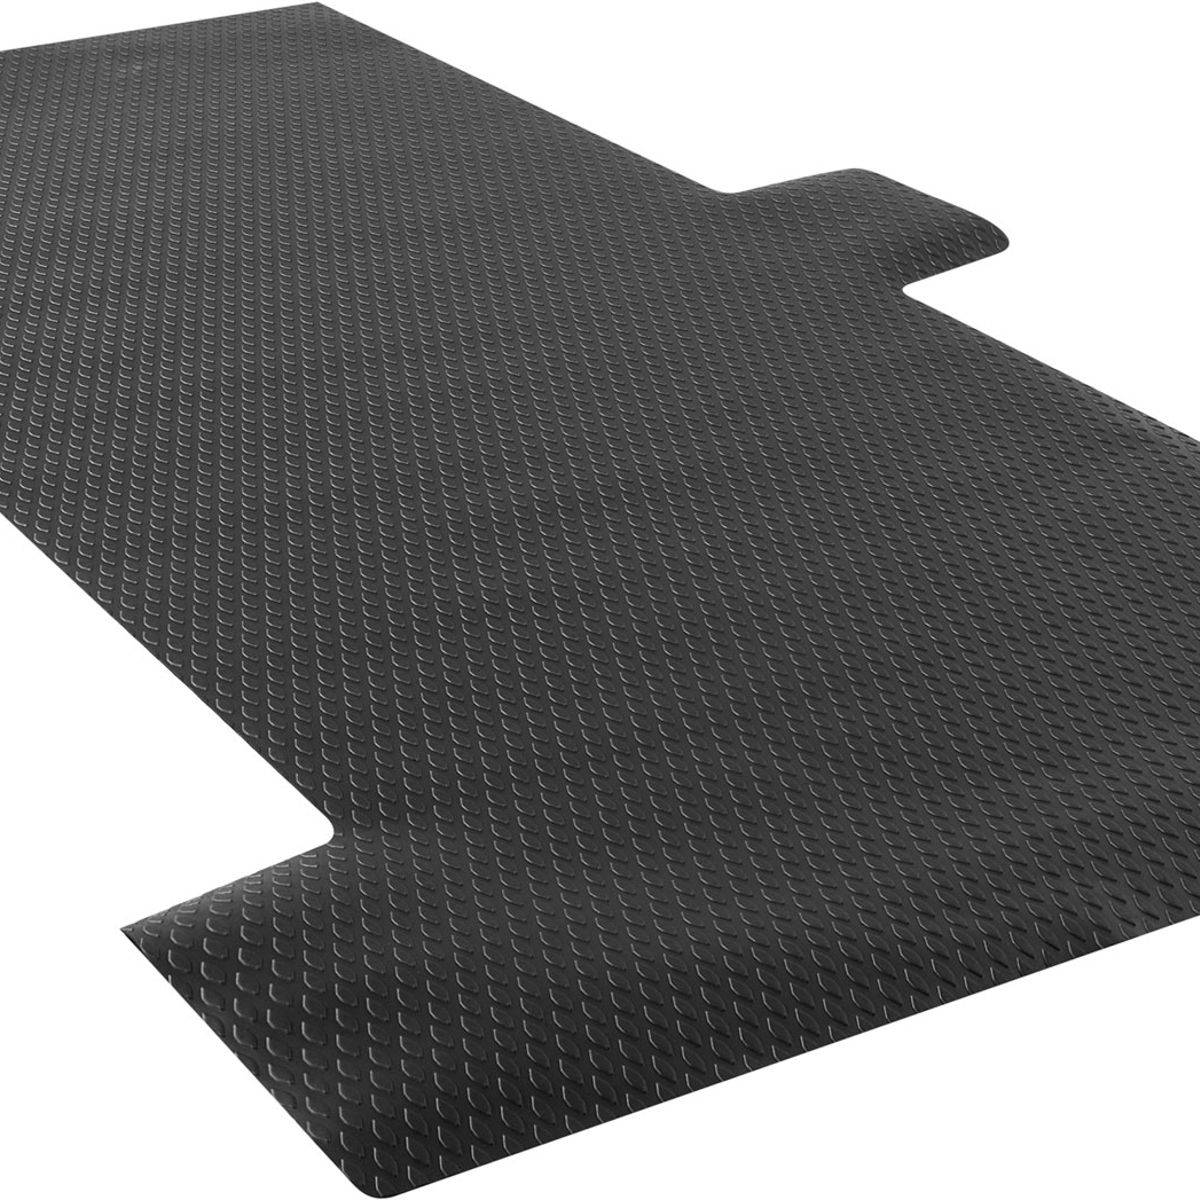 hight resolution of weather guard weather guard van floor mat ford standard wheel base 89017